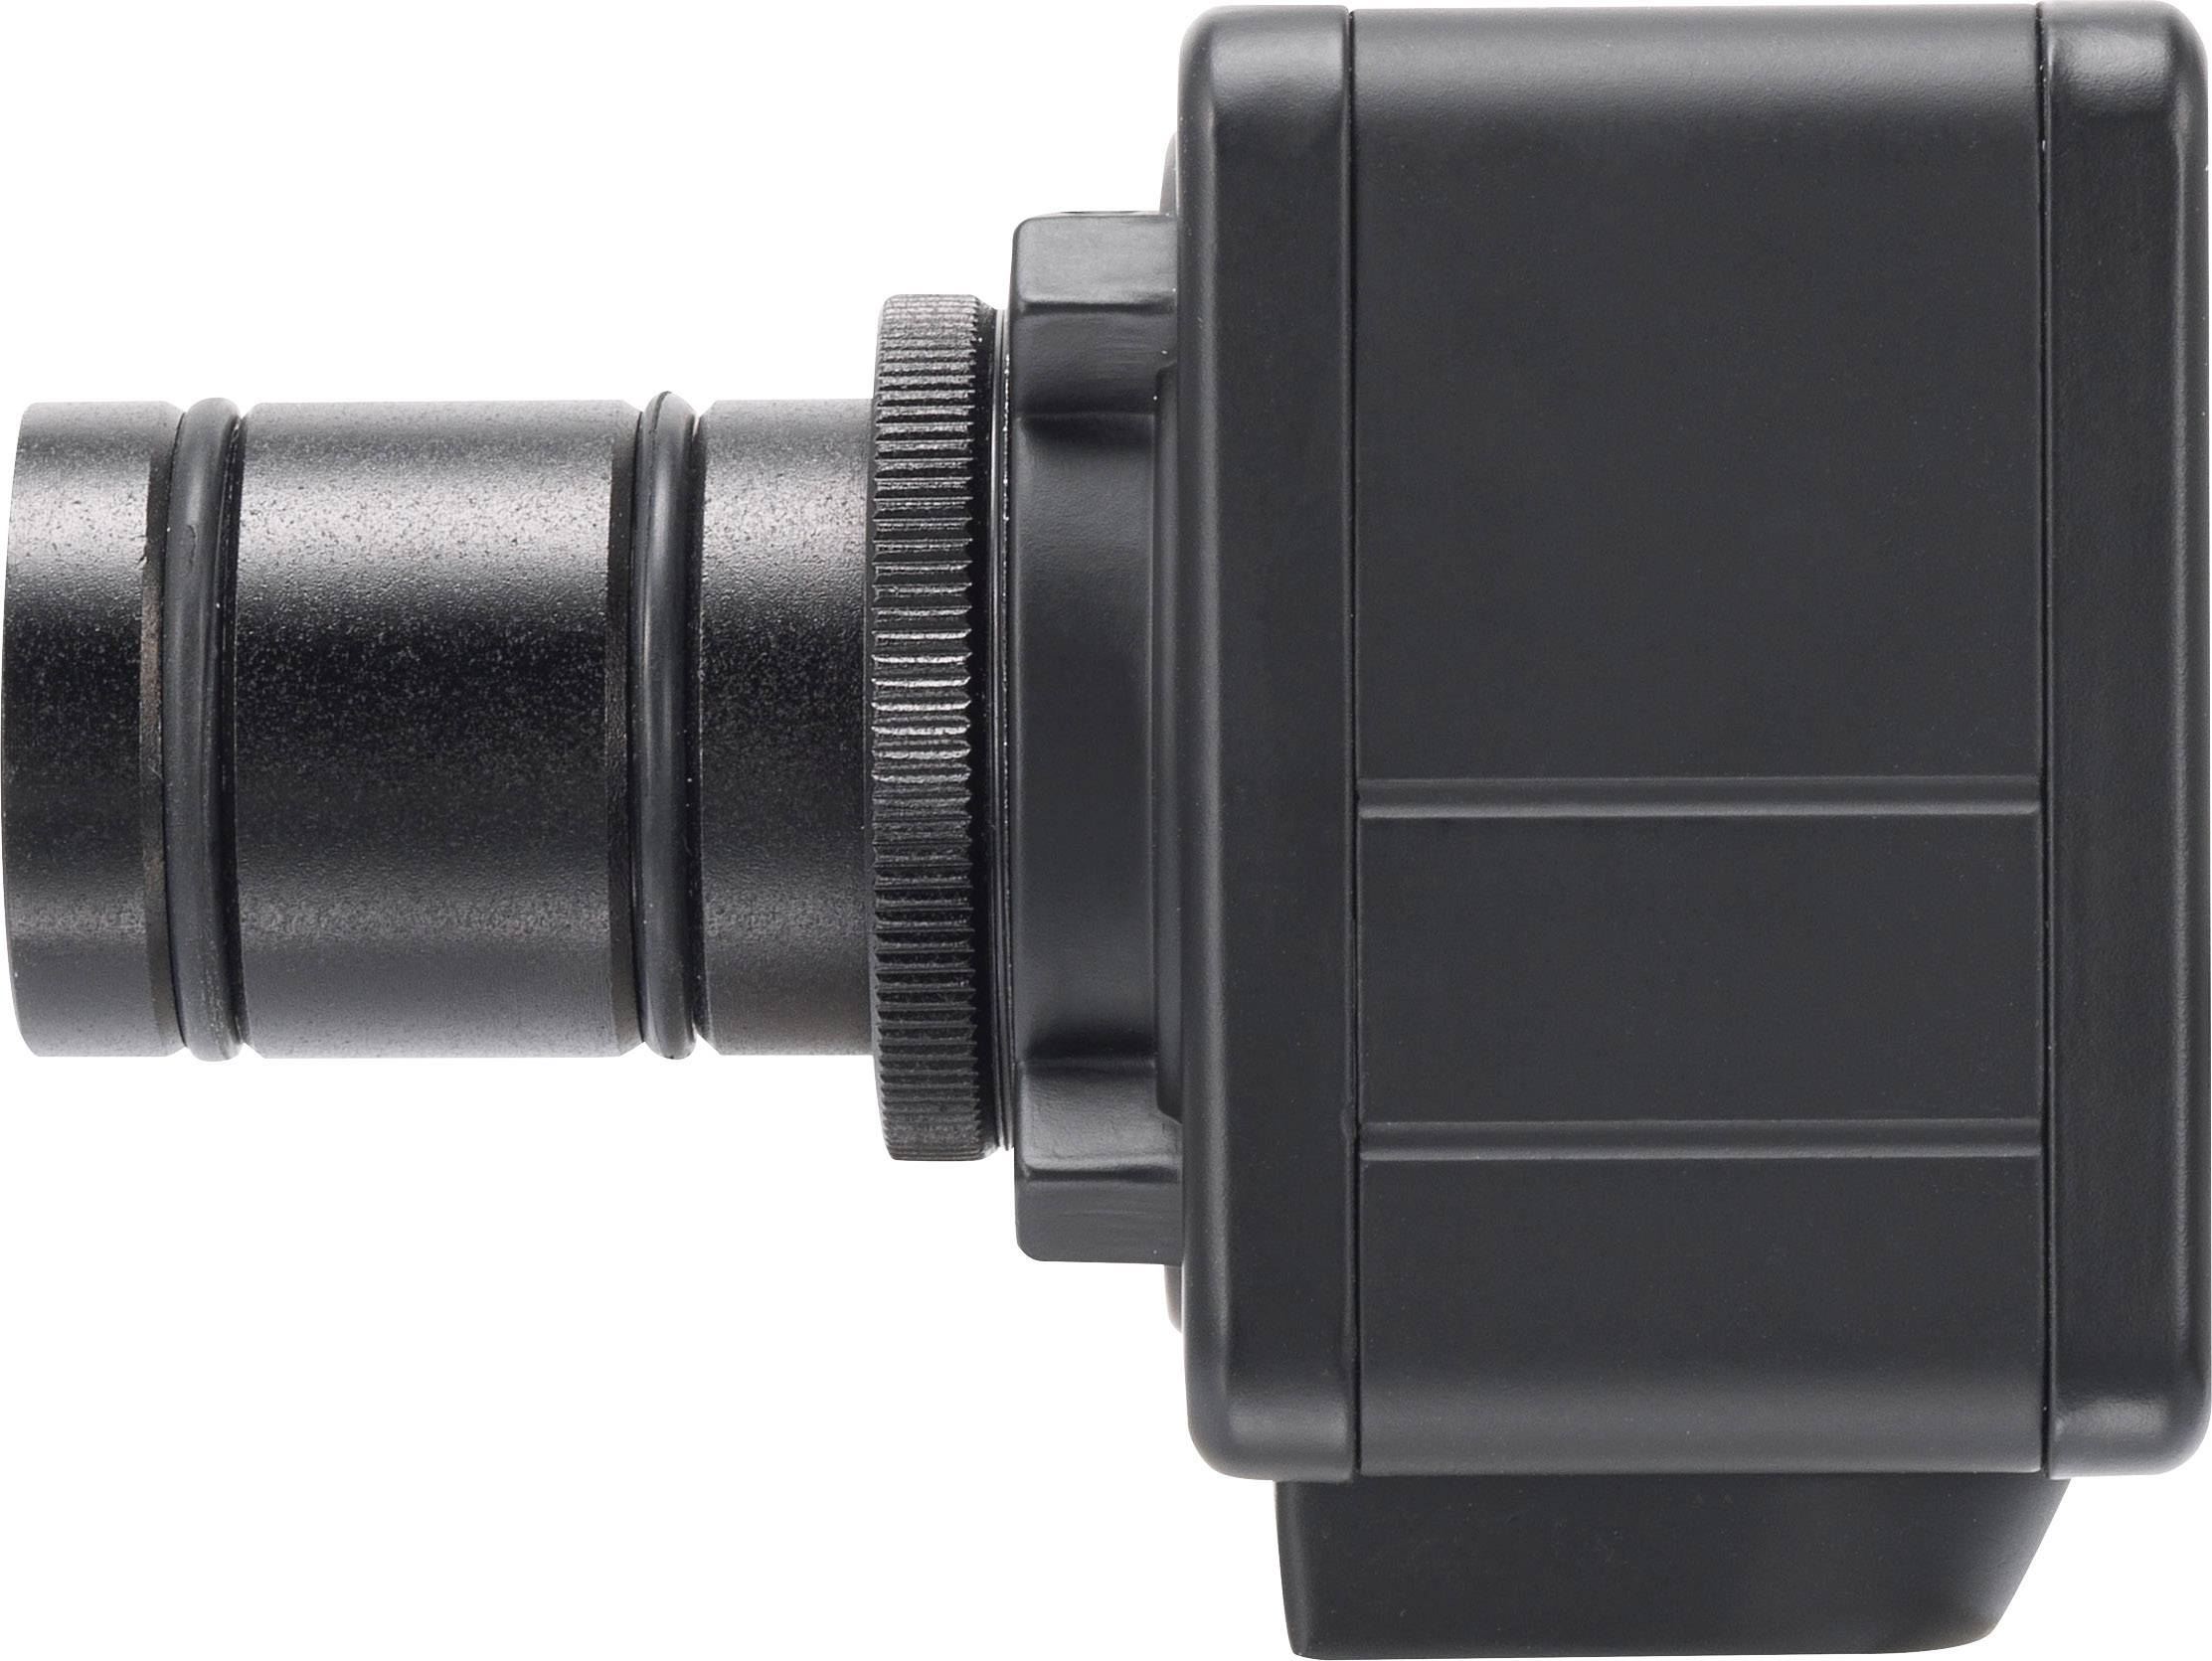 Ccd mikroskop kamera mit megapixel usb amazon kamera